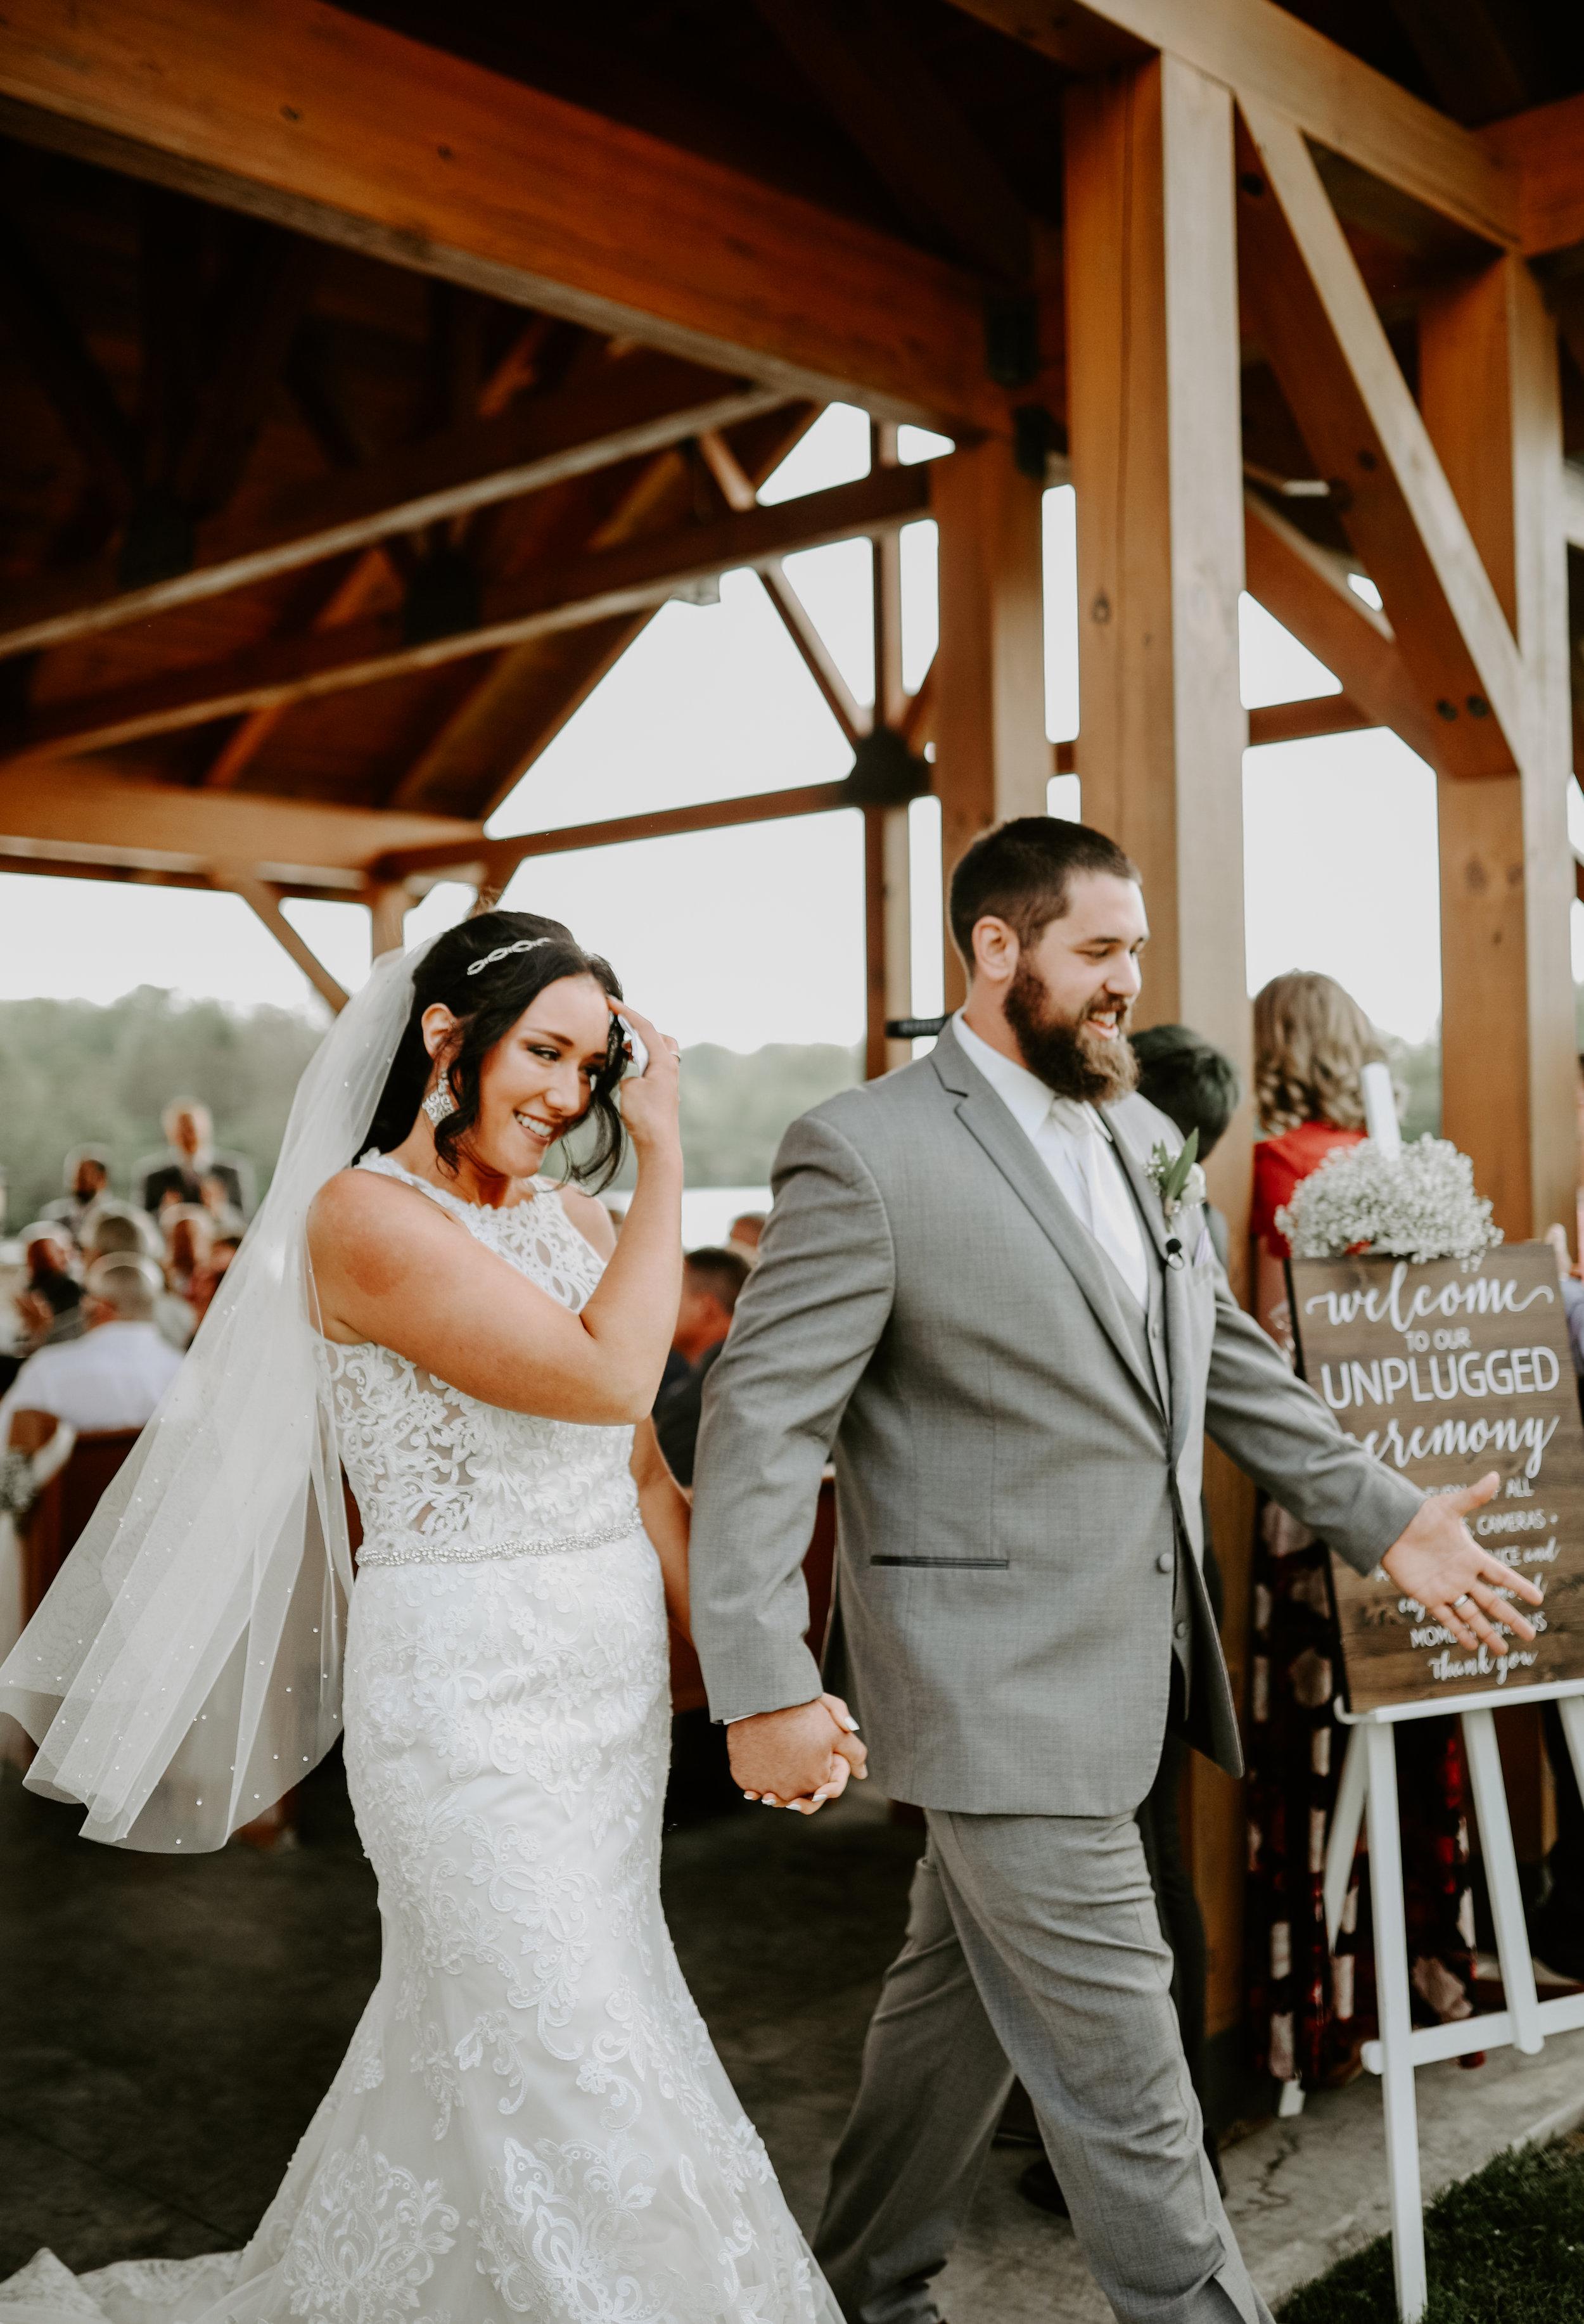 Kylei + Jordan wedding 150 (1 of 1).jpg